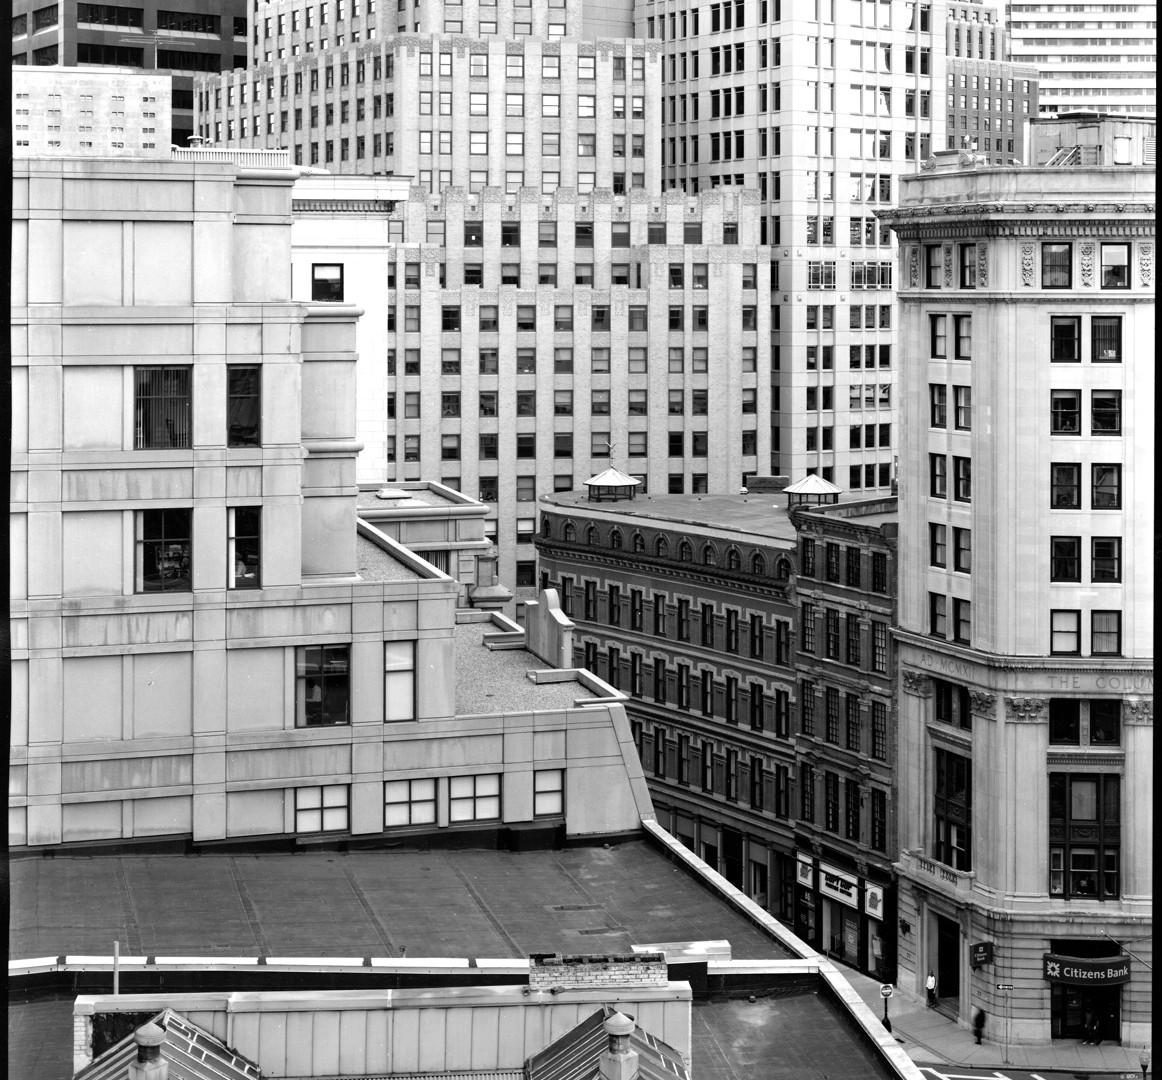 Nicholas Nixon, View toward Hawley Street, Boston, 2008